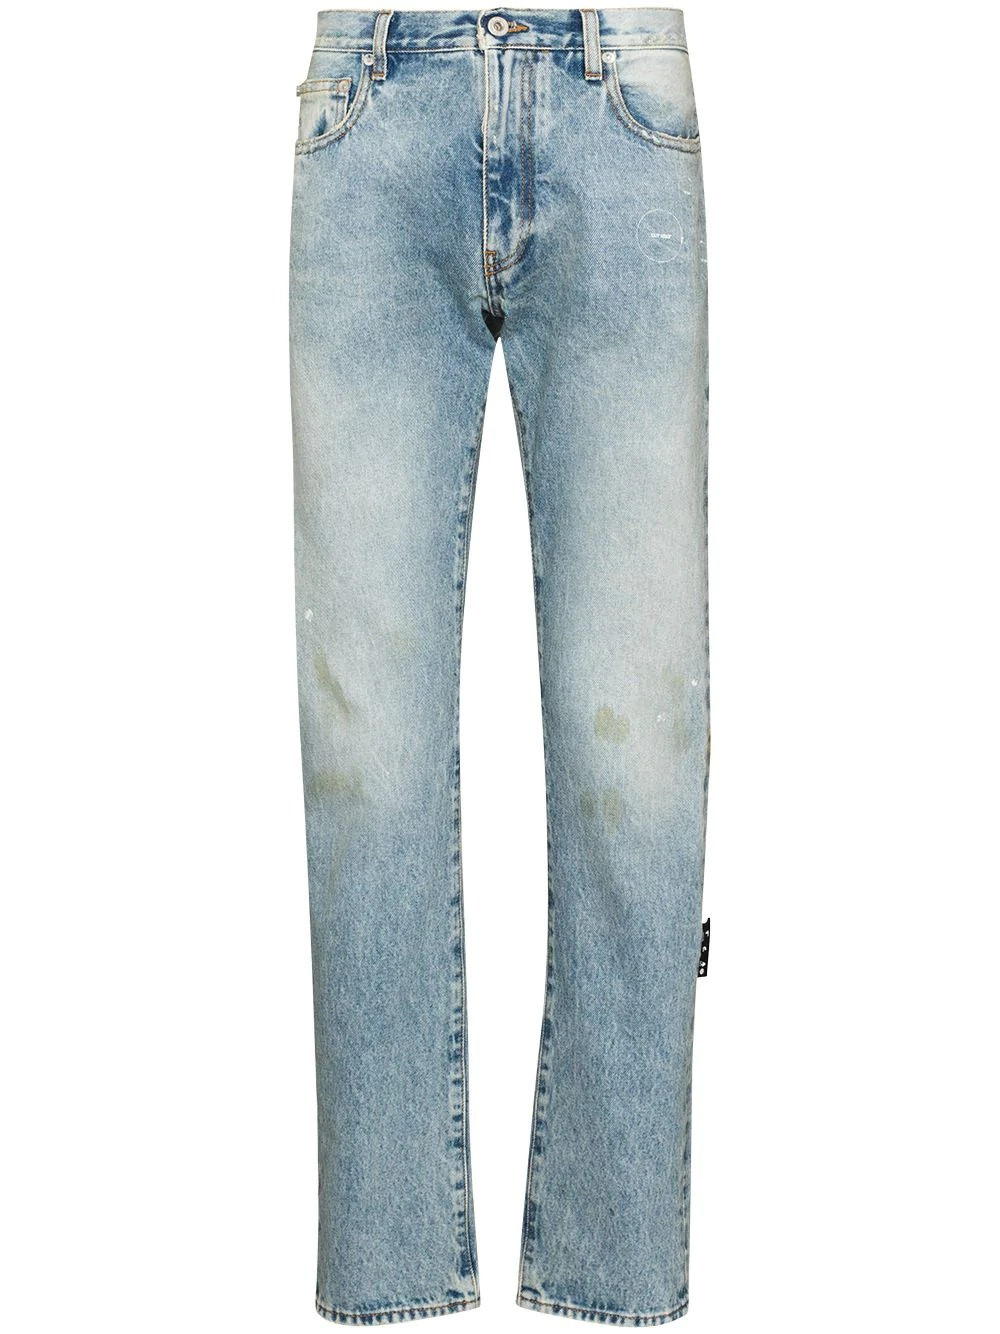 Off-White Logo-Print Slim-Cut Jeans